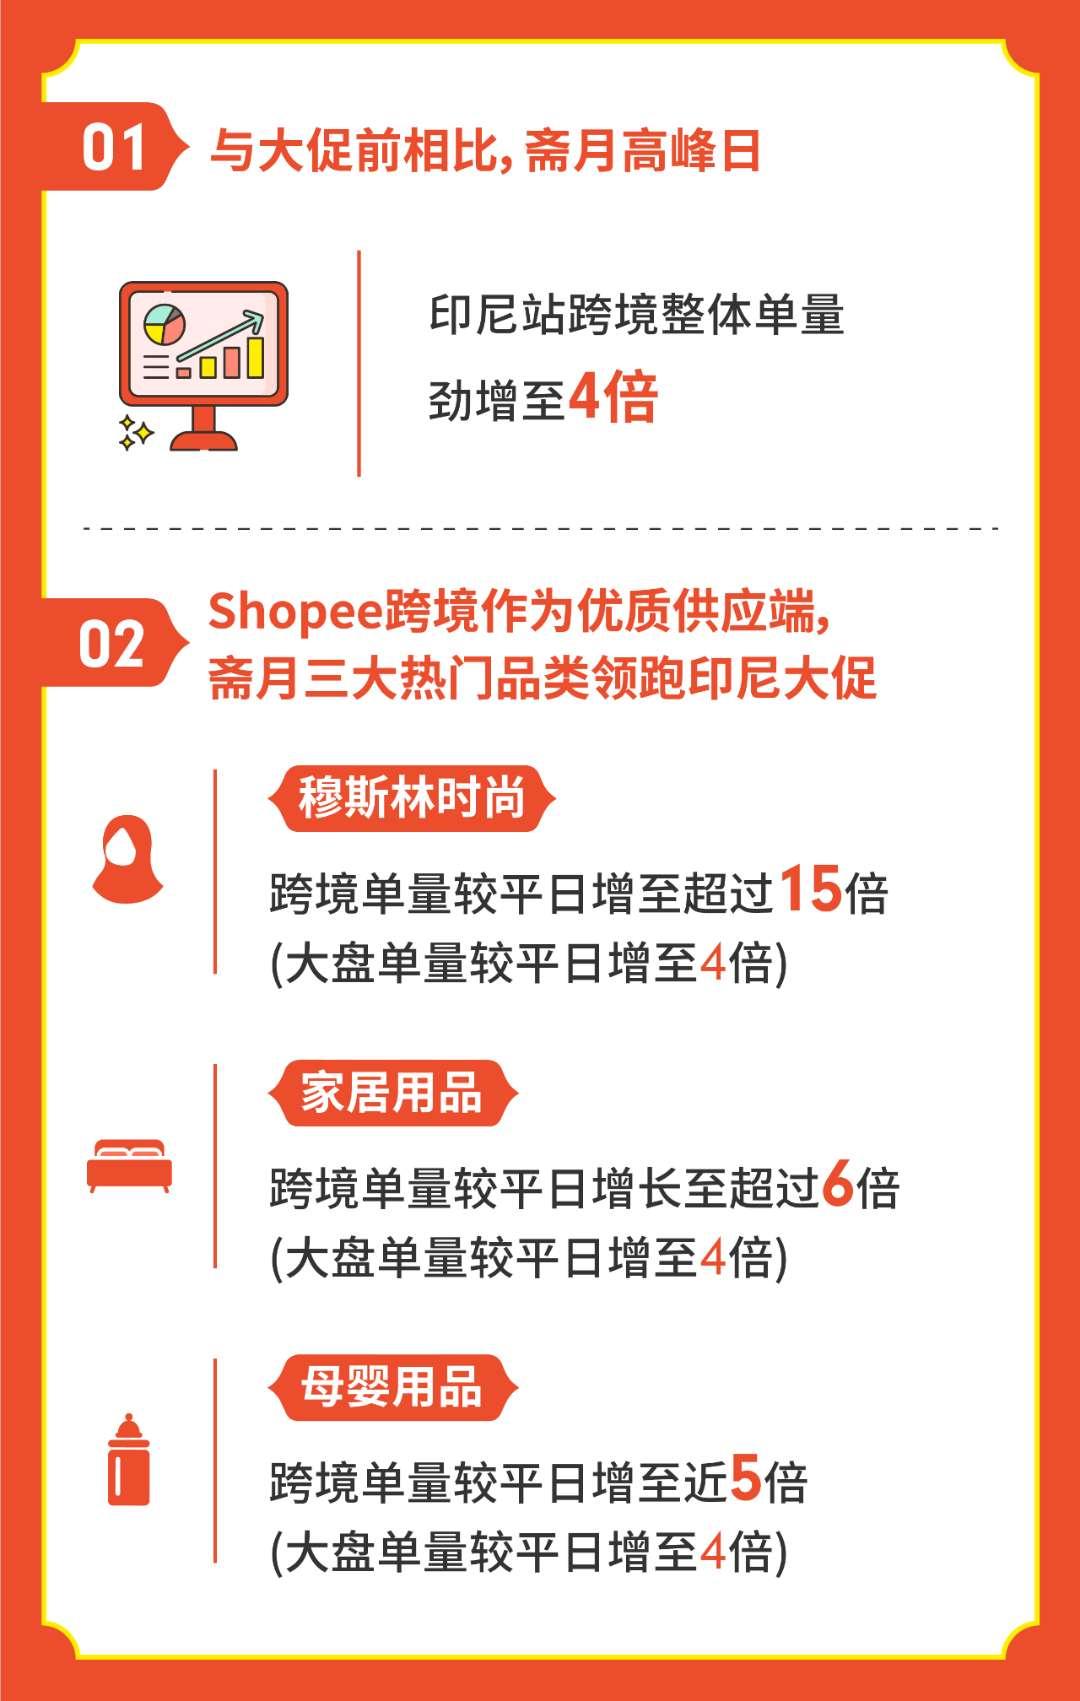 Shopee斋月大促跨境单量增至4倍,家居用品、穆斯林时尚及母婴用品涨幅赶超大盘.jpg